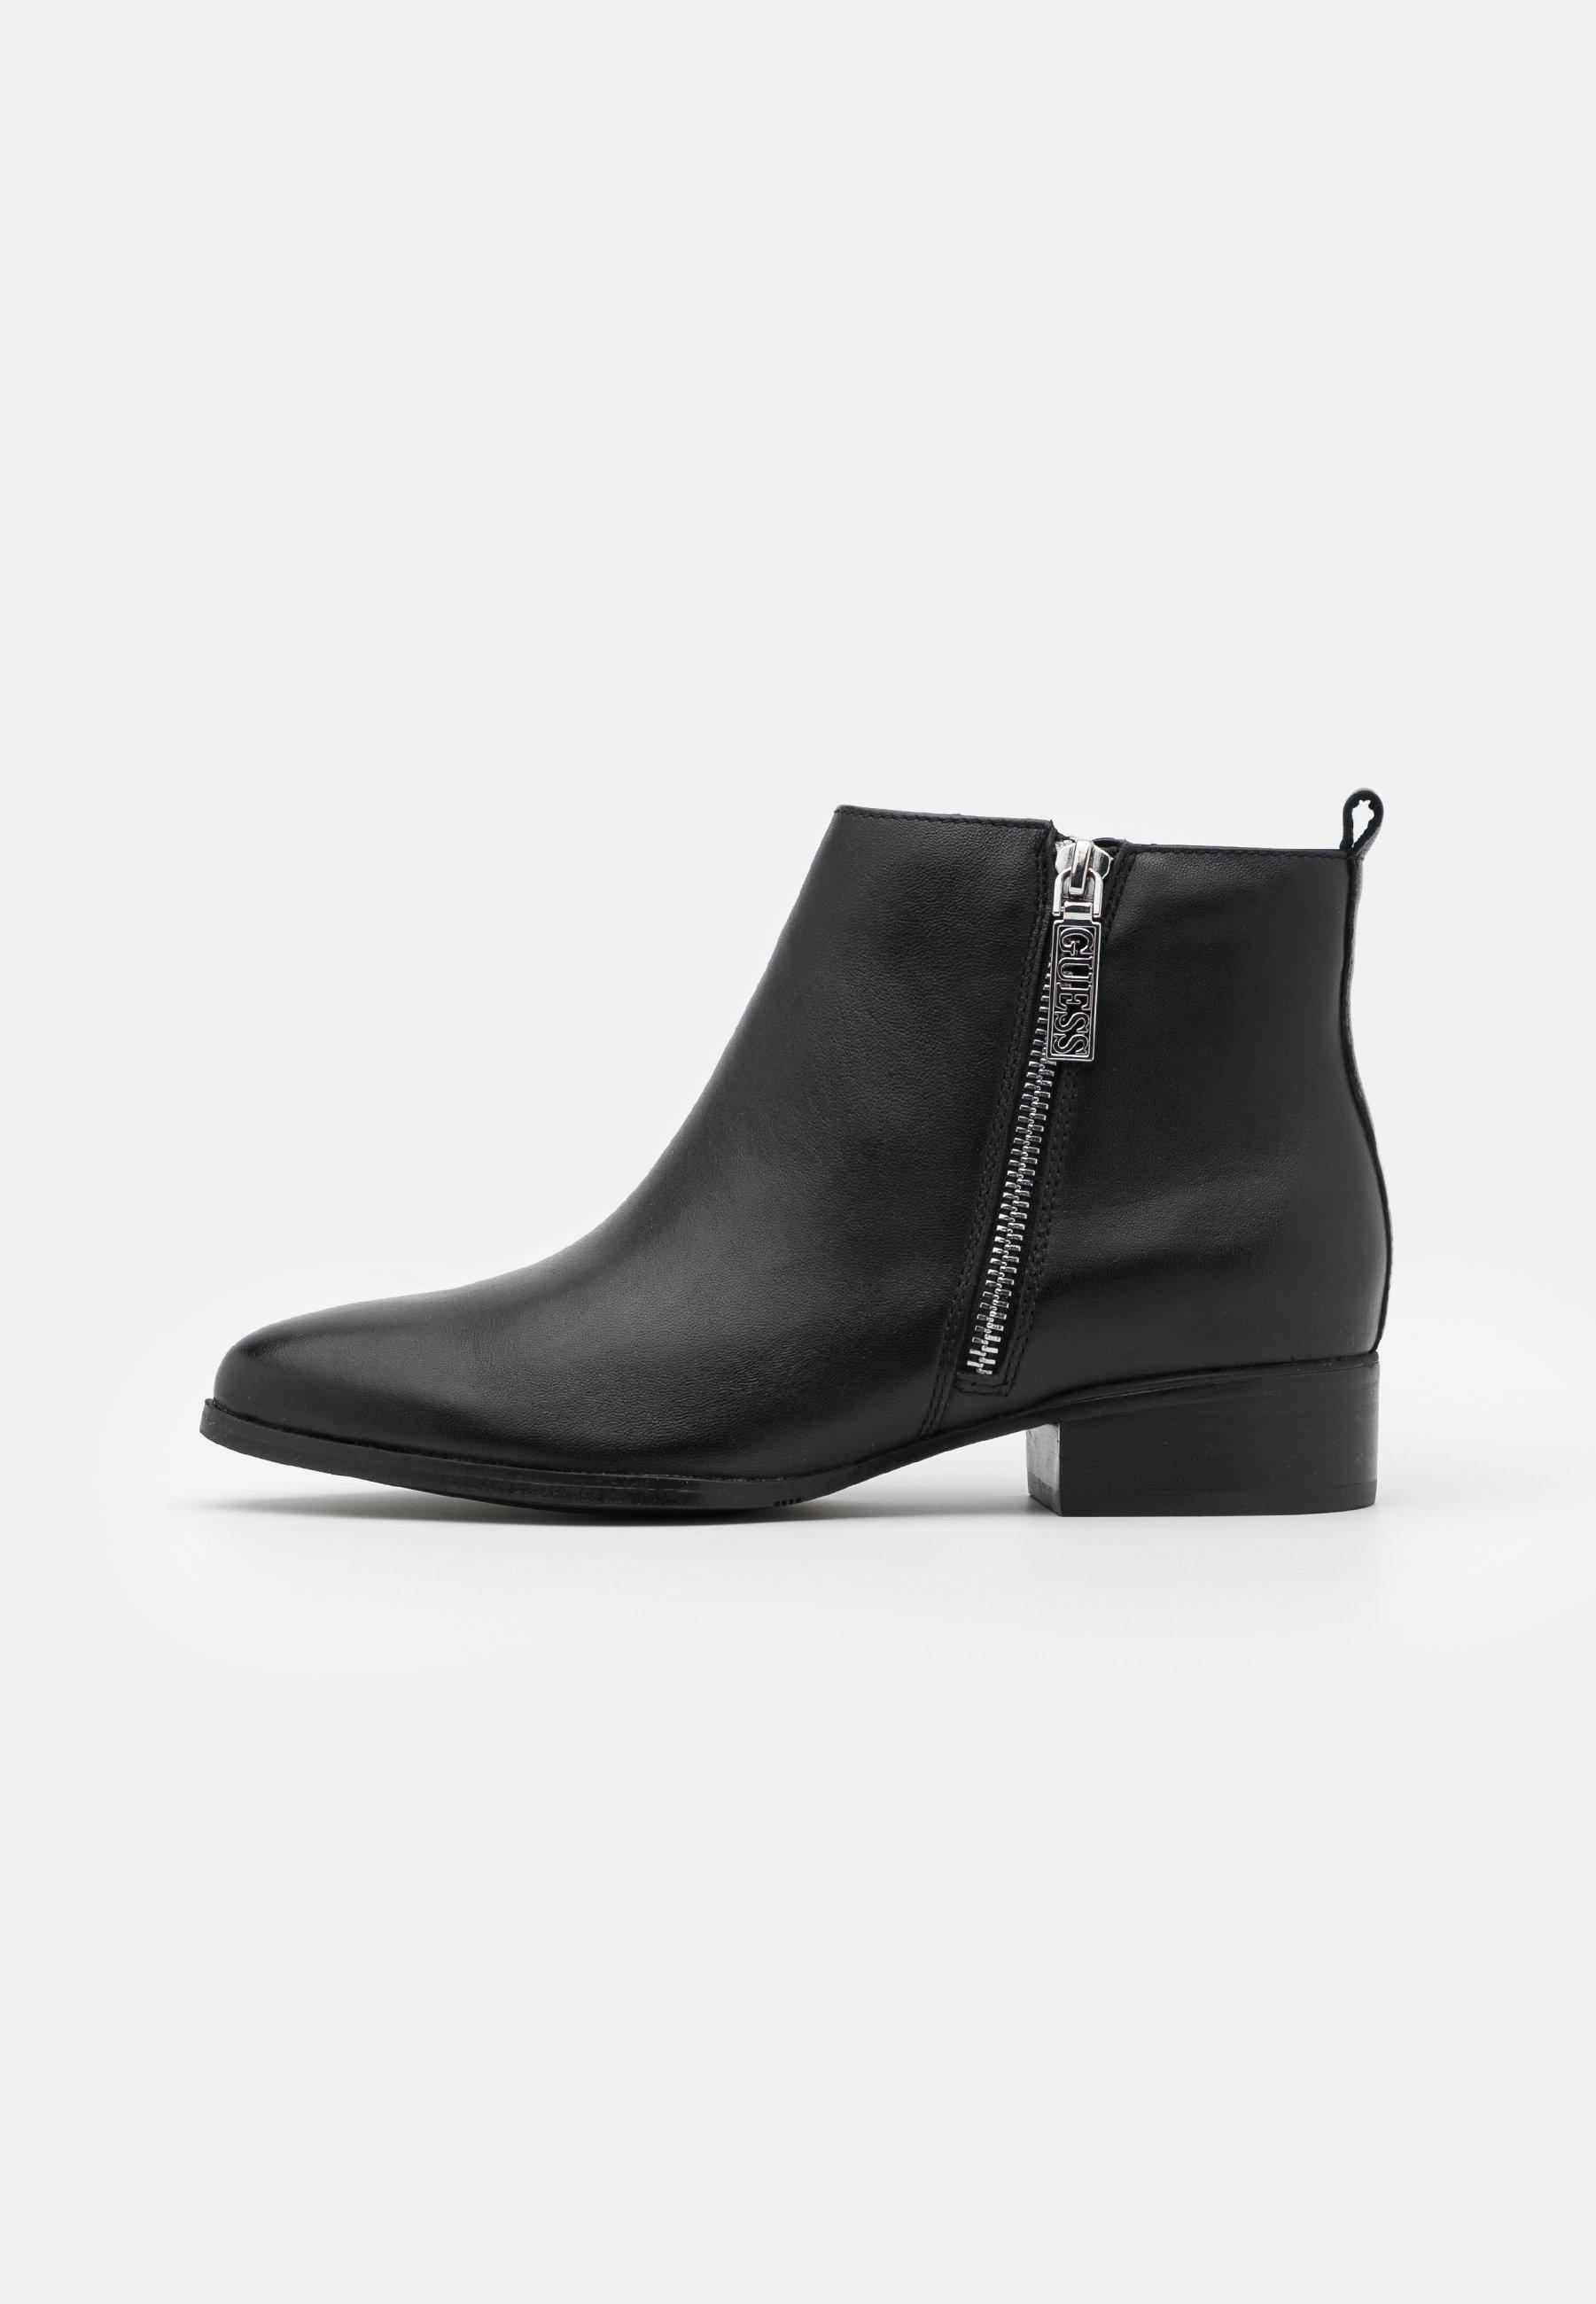 Guess Valony - Ankelstøvler Black